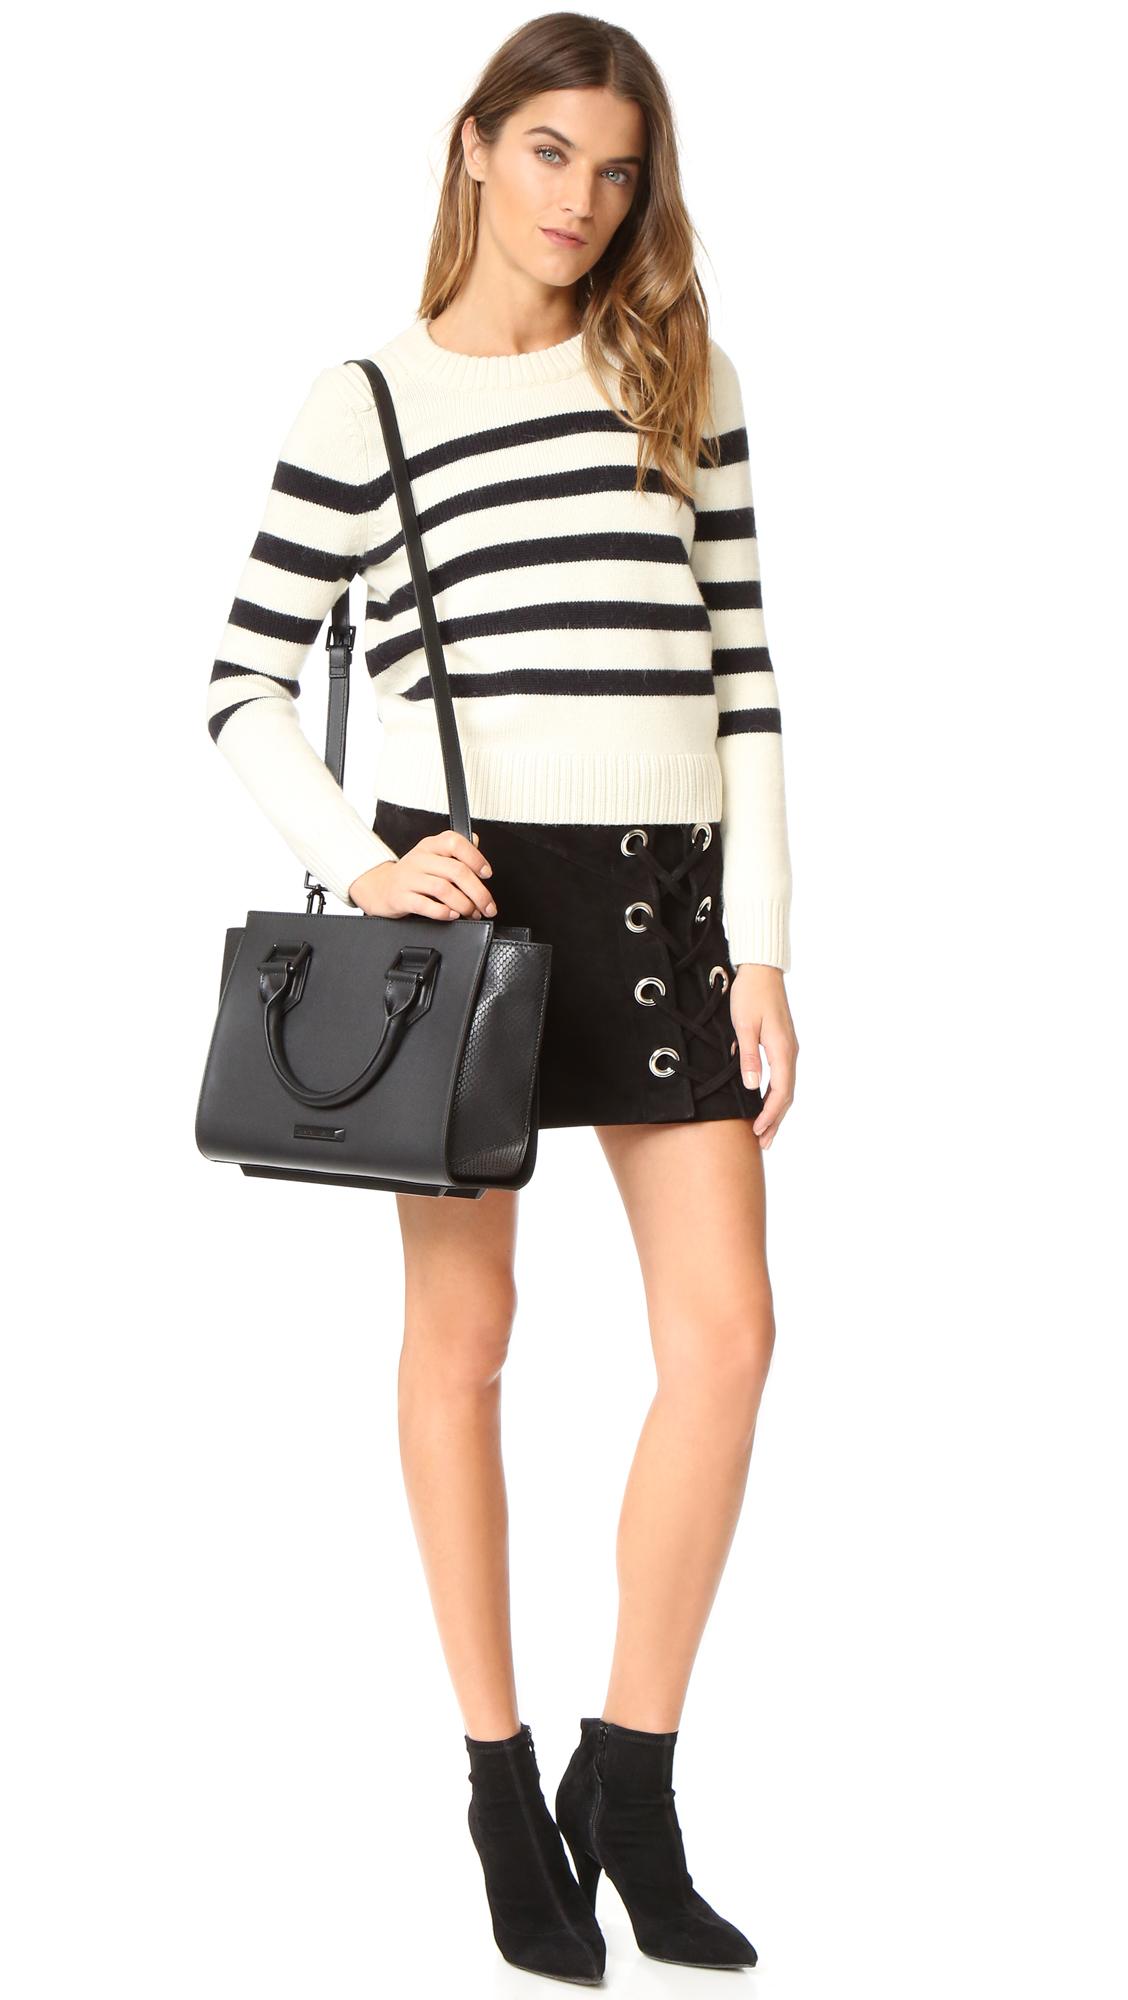 Kendall+KylieBrooke satchel En Vrac Modèles Acheter Coût Pas Cher RzAiD